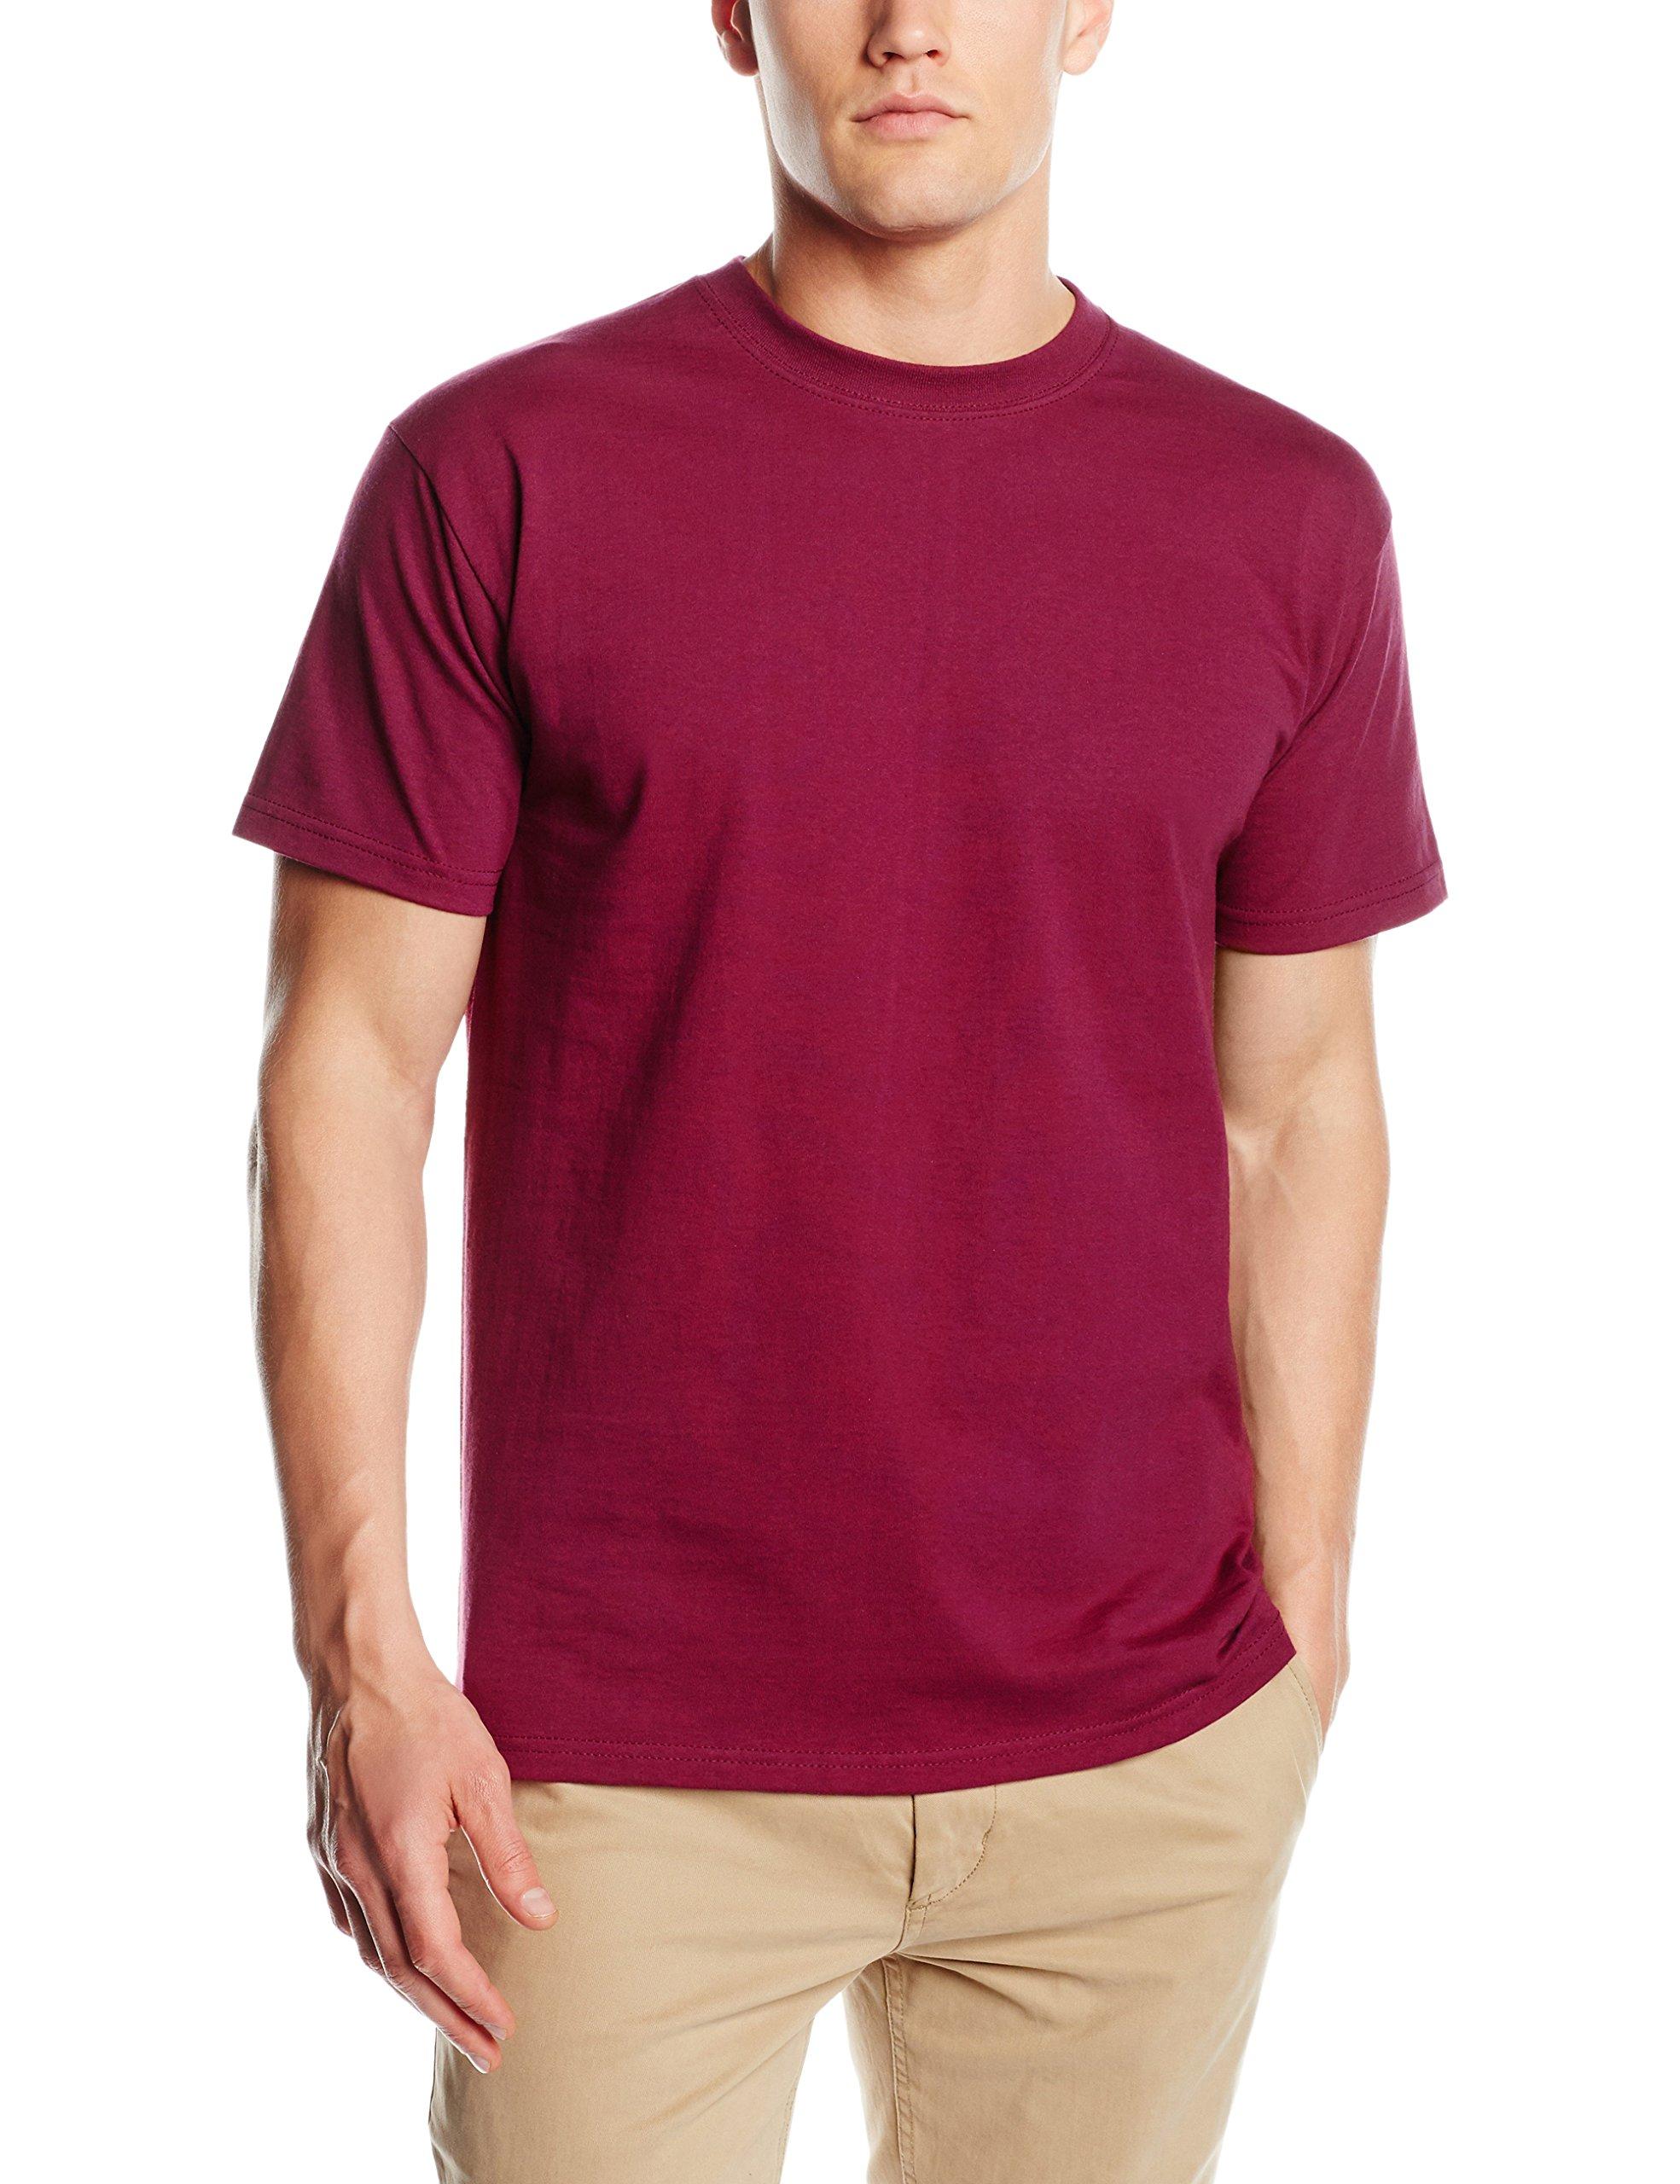 T-Shirt 'Super Premium Tee' - Farbe: Burgundy - Größe: M